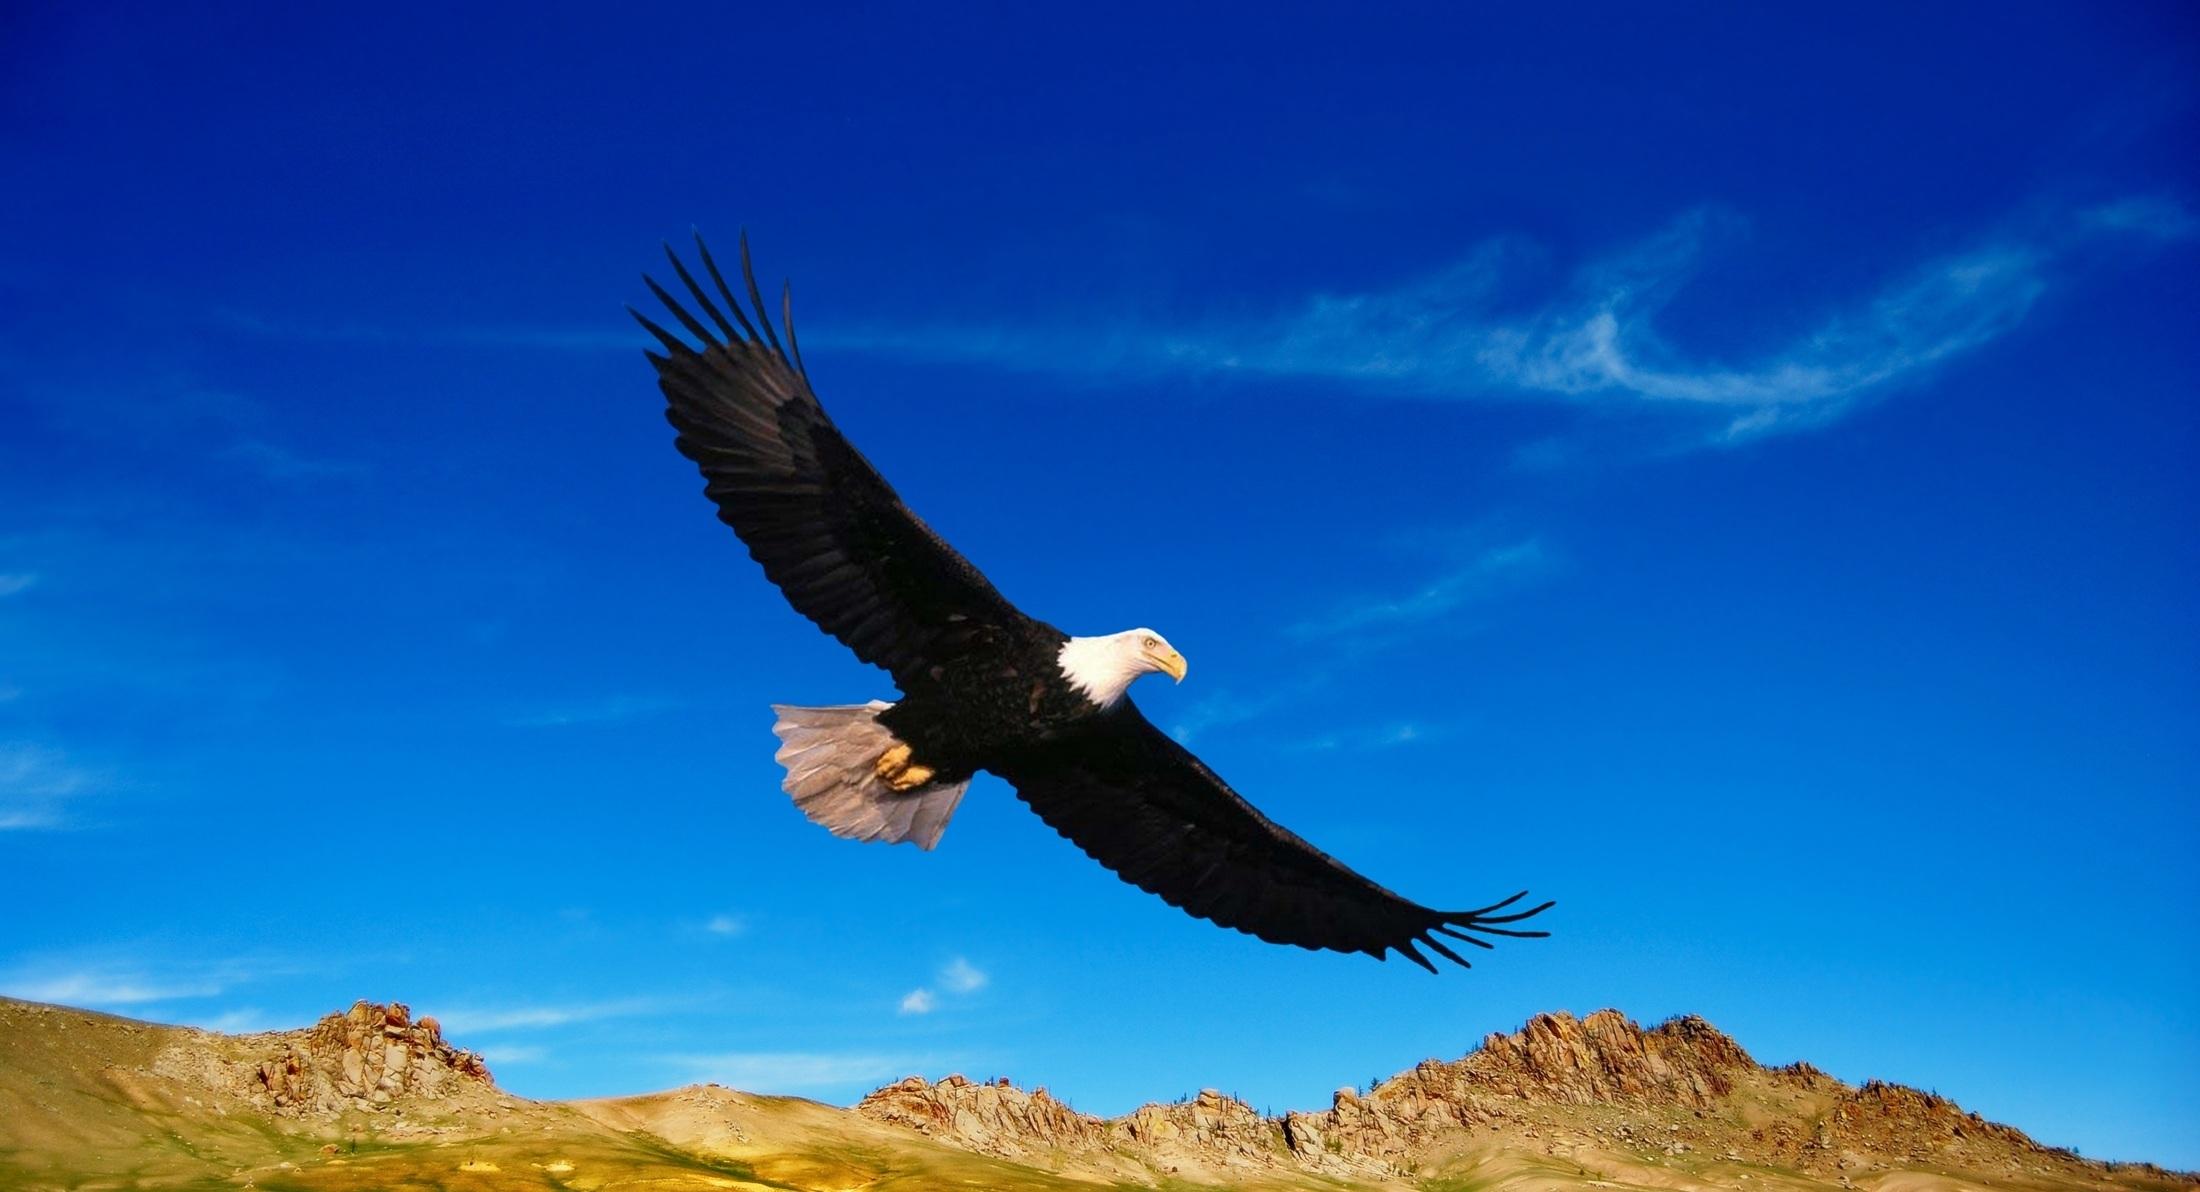 nature-bird-wing-sky-prairie-fly-677705-pxhere.com.jpg